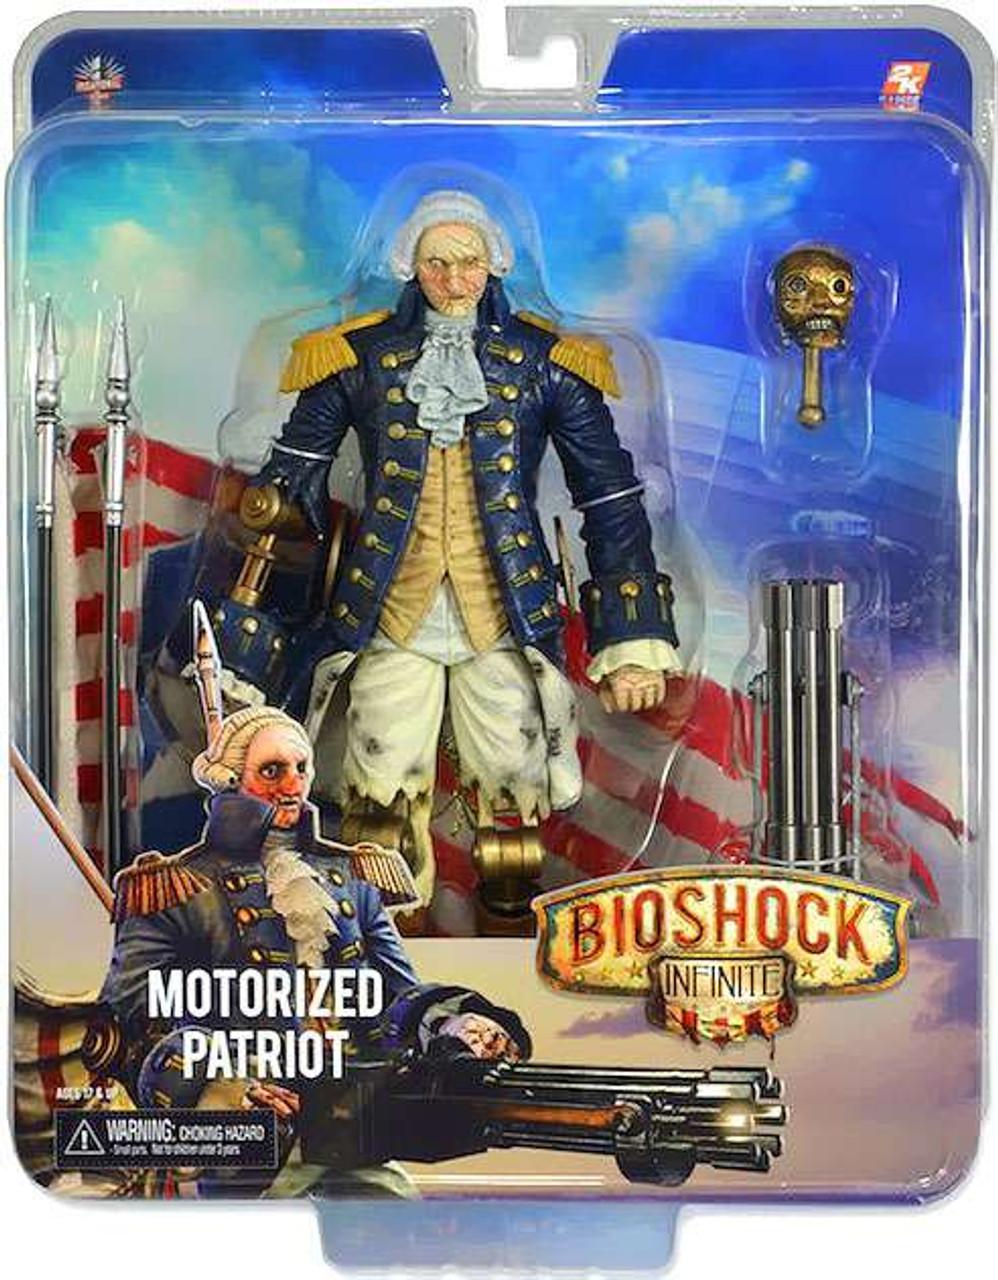 Neca Bioshock Infinite Motorized Patriot George Washington Action Figure Damaged Package